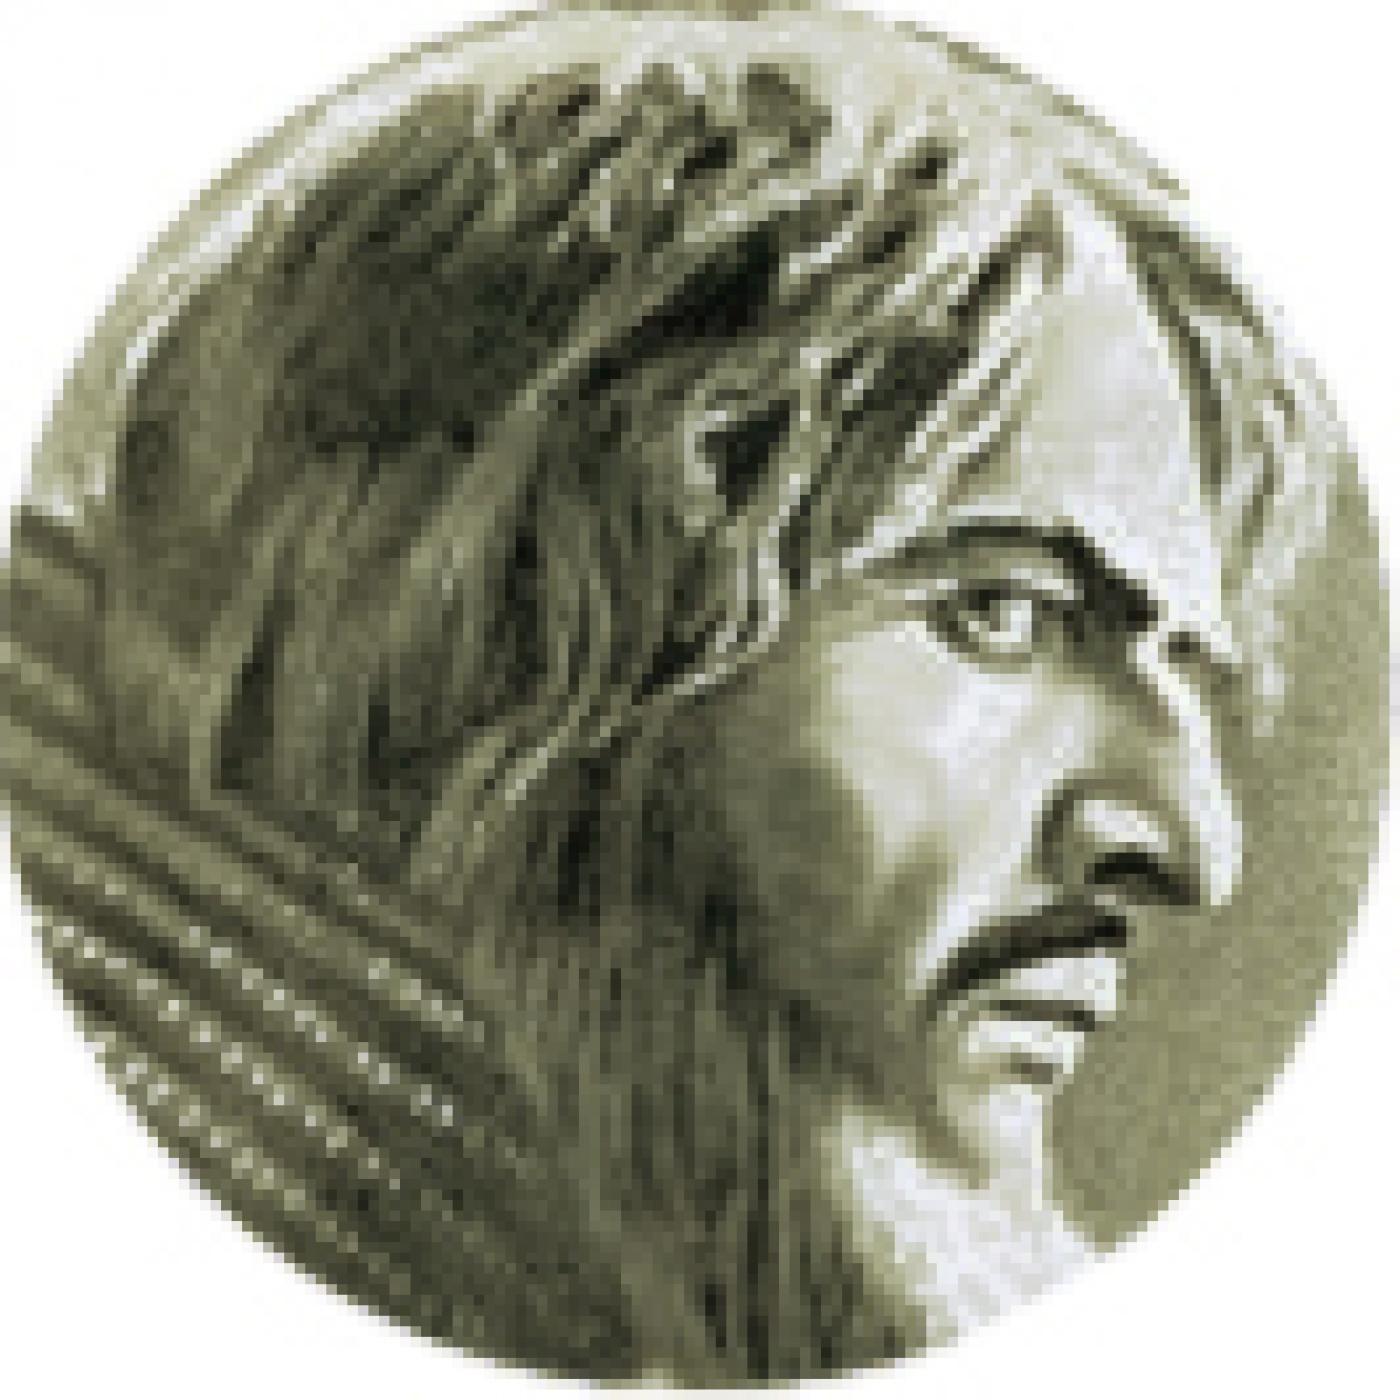 Jose Maria Casanovas Rojas